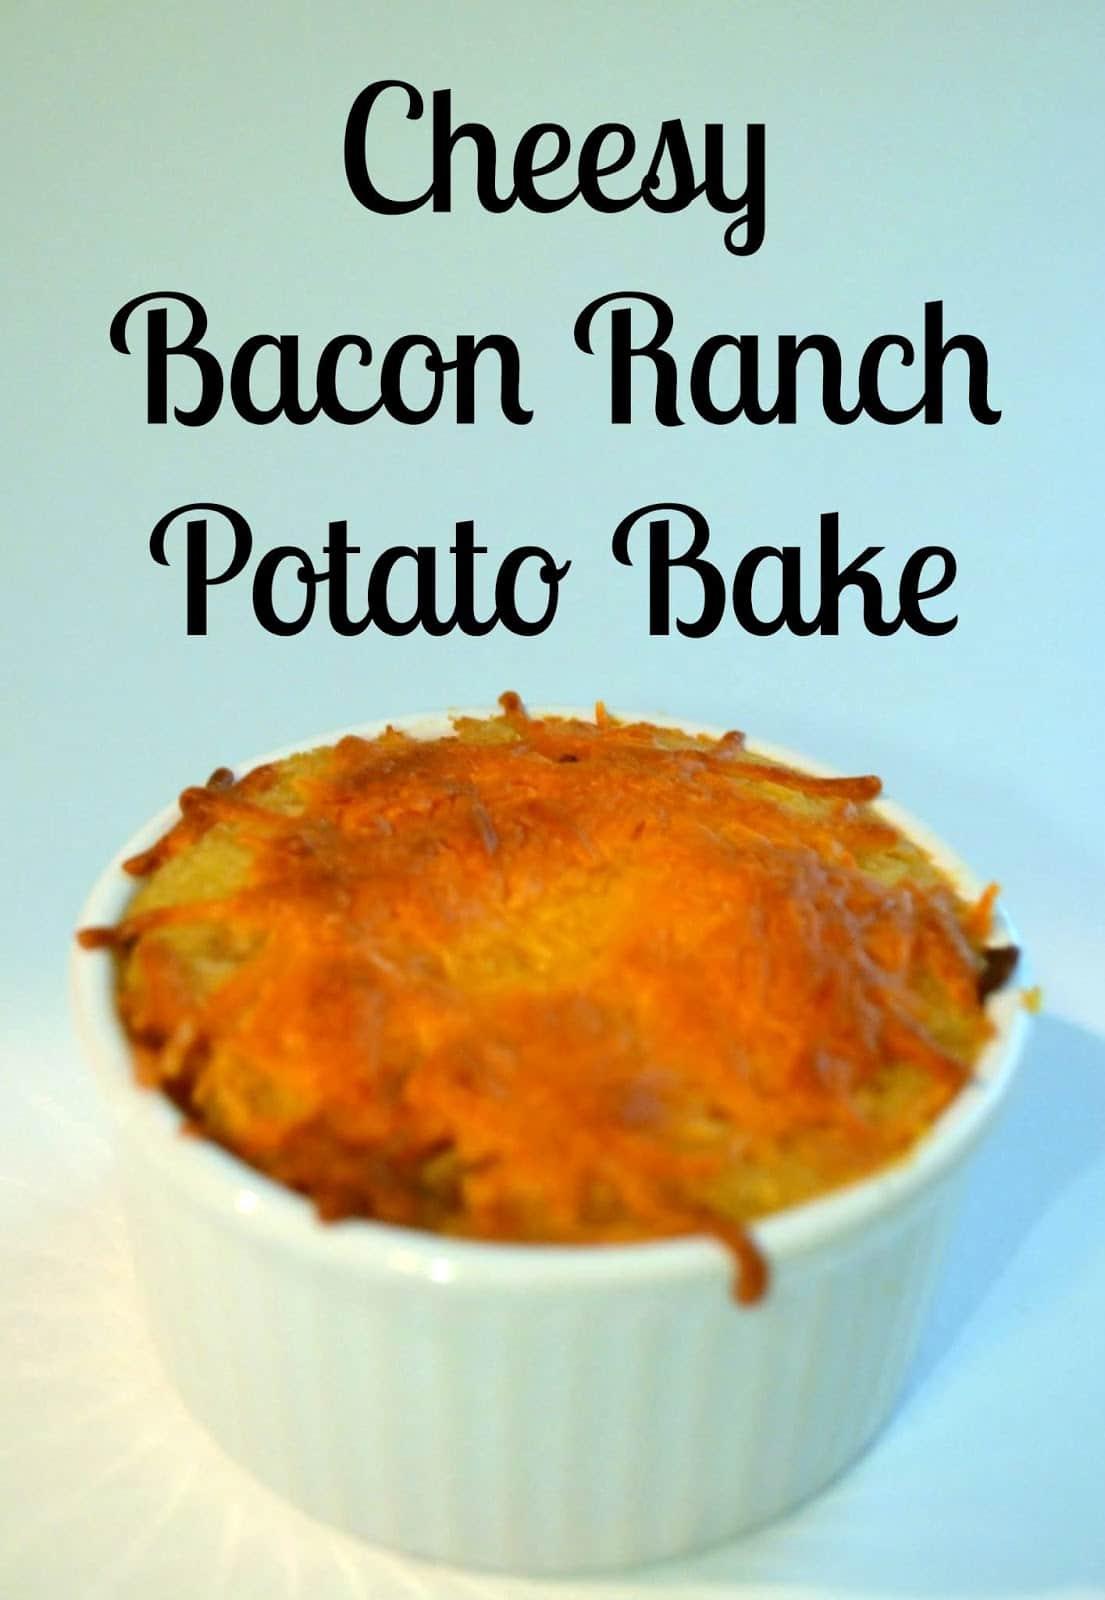 Recipes} Thanksgiving Cheesy Bacon Ranch Potato Bake and Oatmeal ...